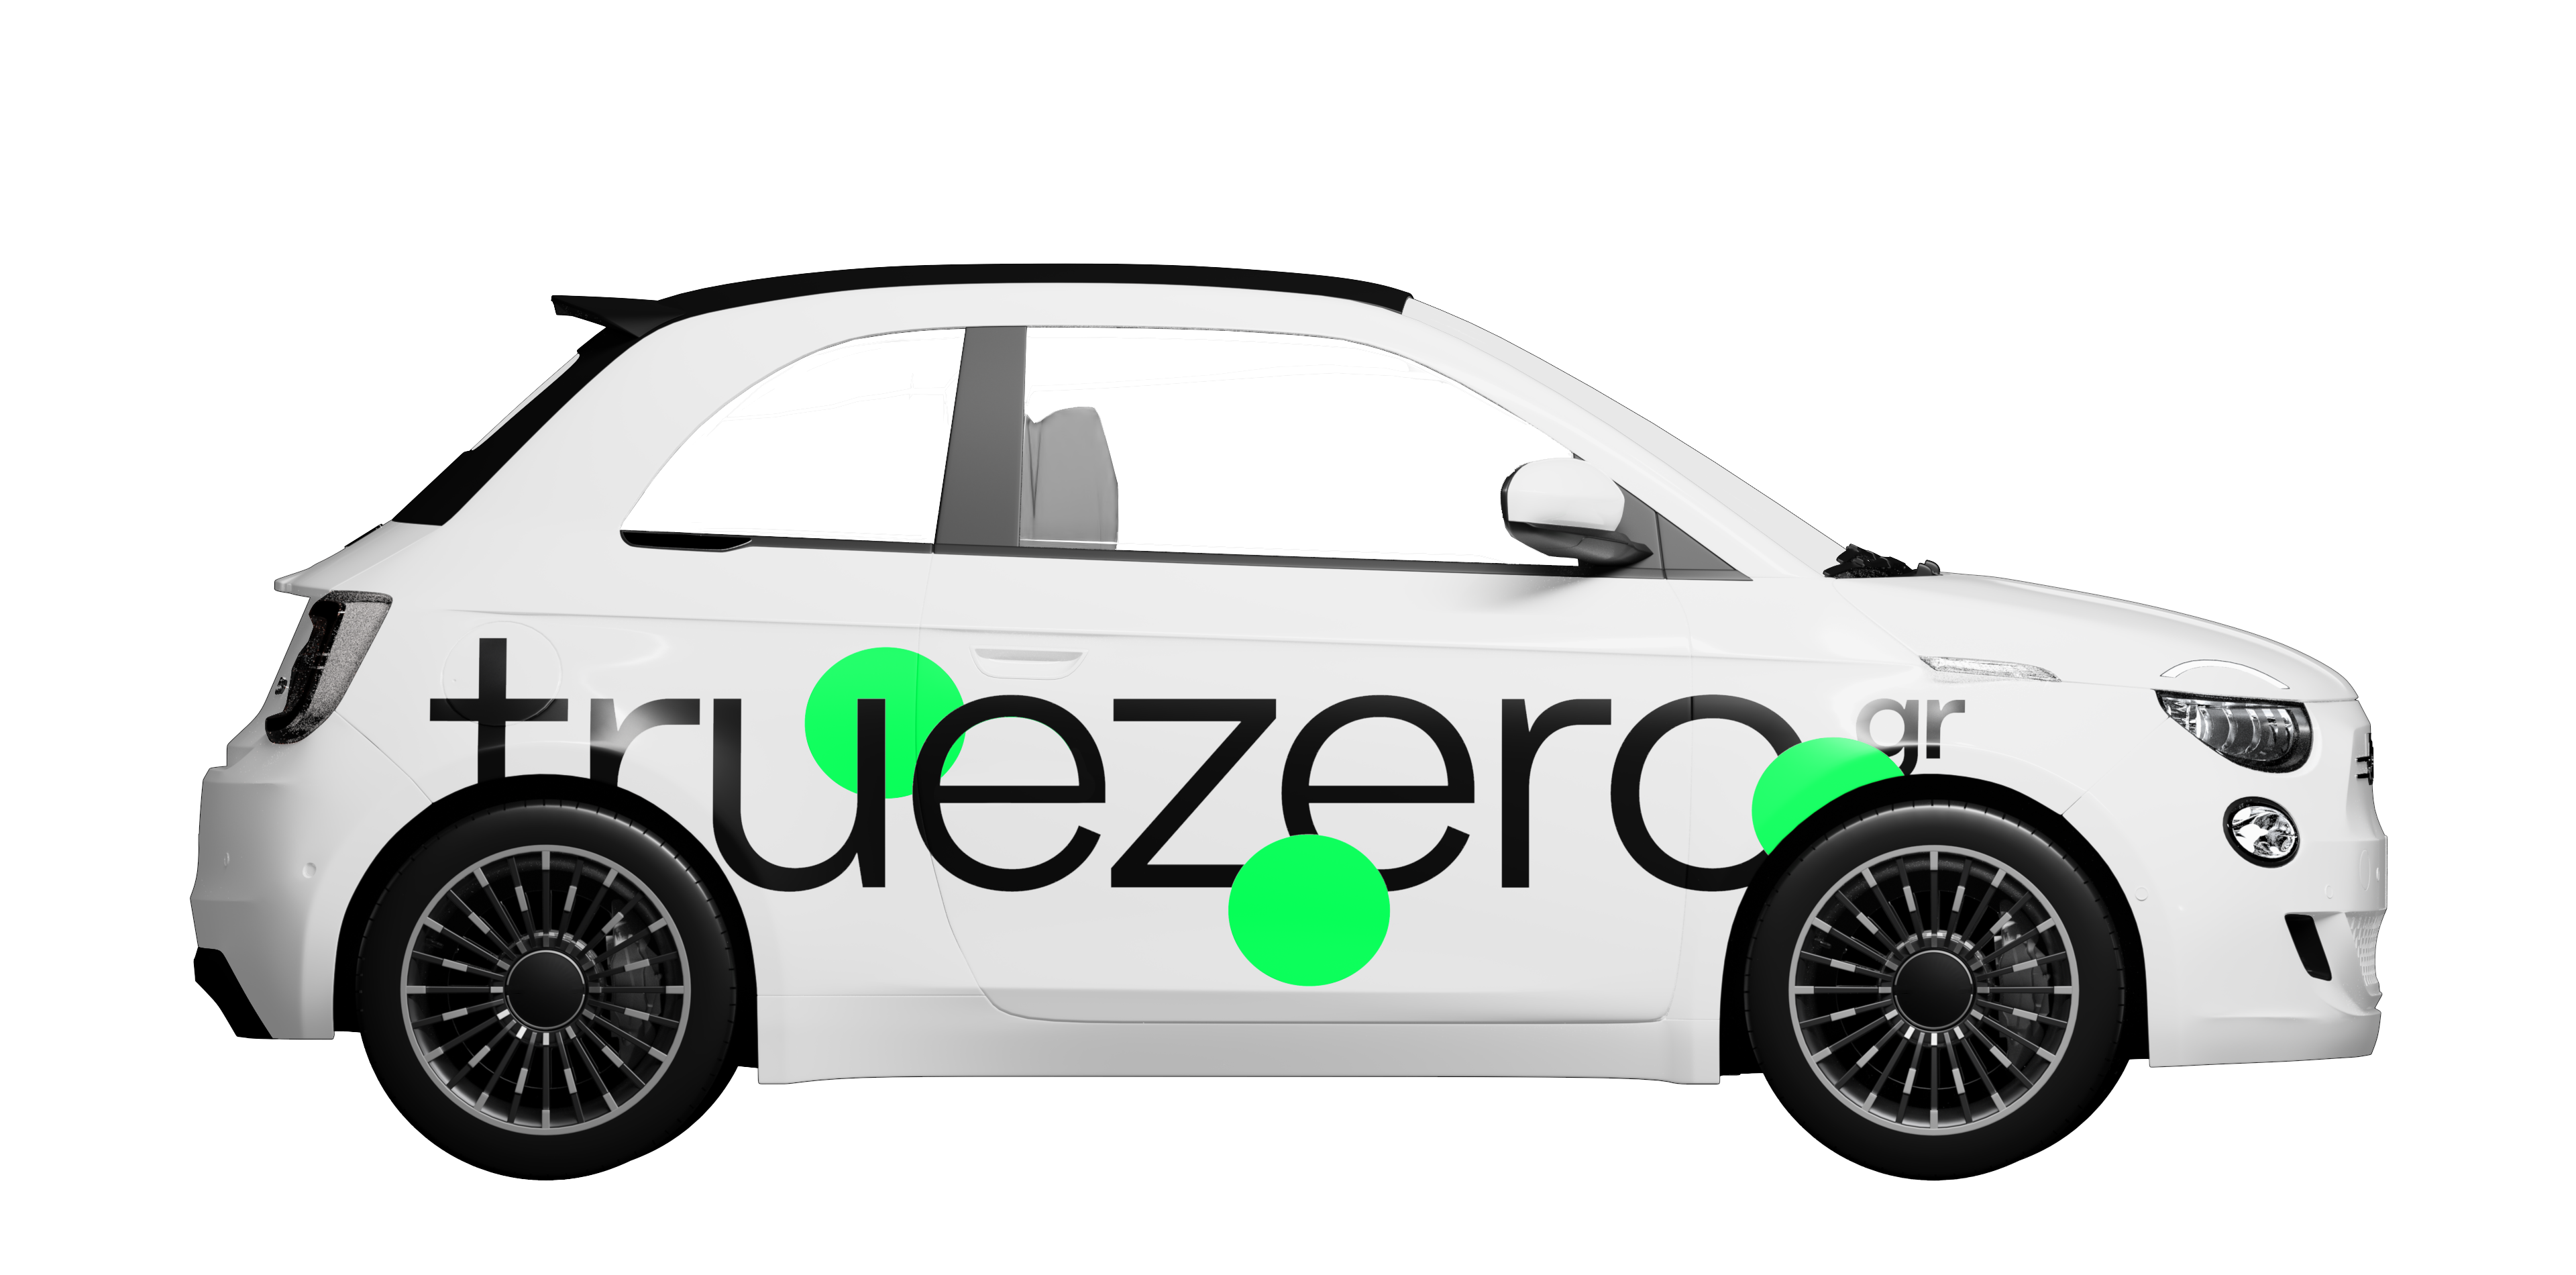 truezero_realcar_side_logo